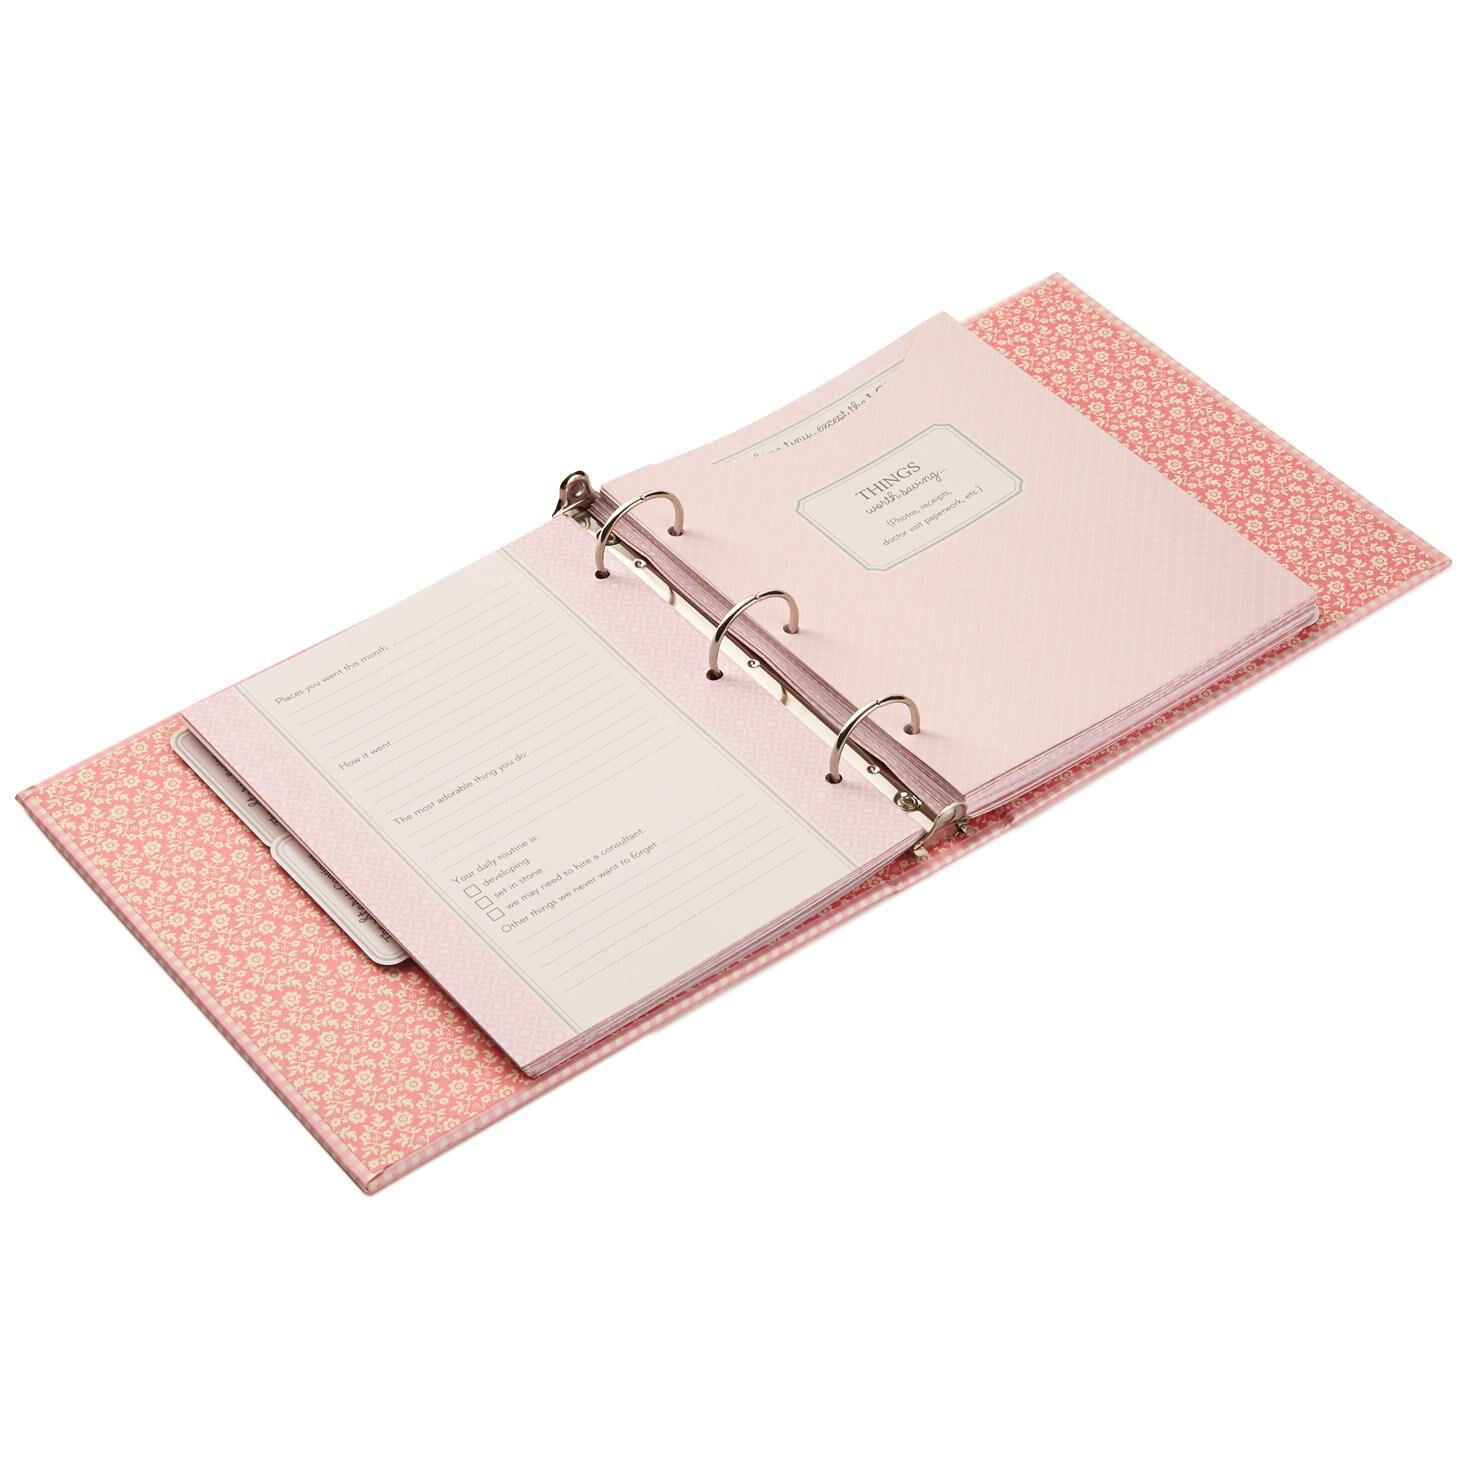 Baby Girl\u0027s First Year Memory Book, New Photo Albums \u0026 Books | Hallmark